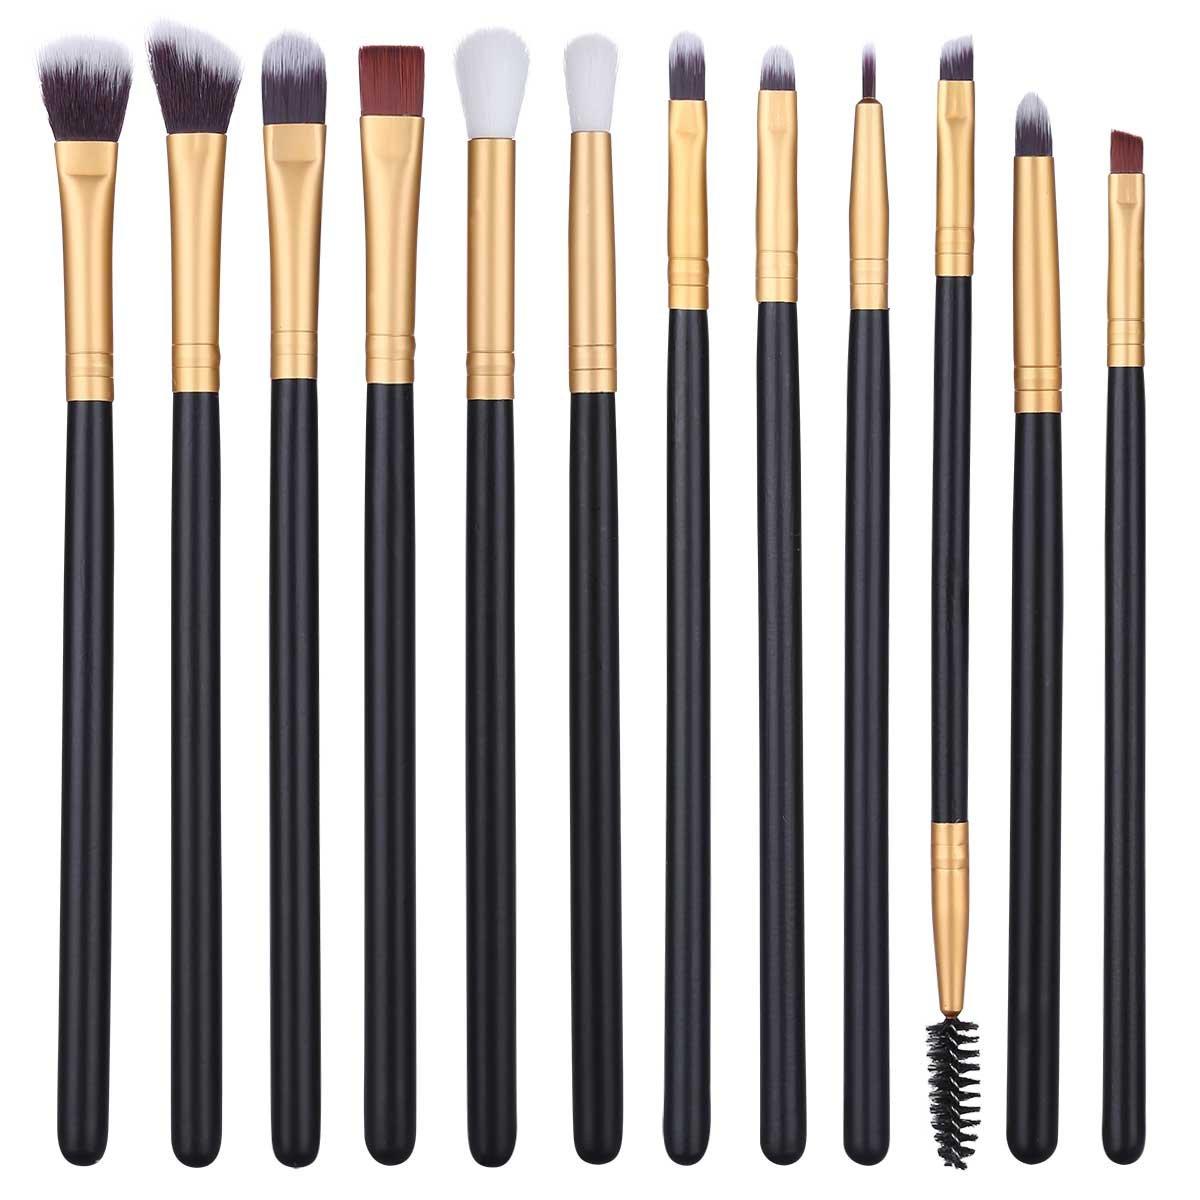 12Pcs Eye Makeup Brushes, Professional Eye Brush Set for Shading or Blending of Eyeshadow Crease Powder Eyebrow Eyeliner Highlighter Brush Essential Concealer Cosmetics Brush Tool